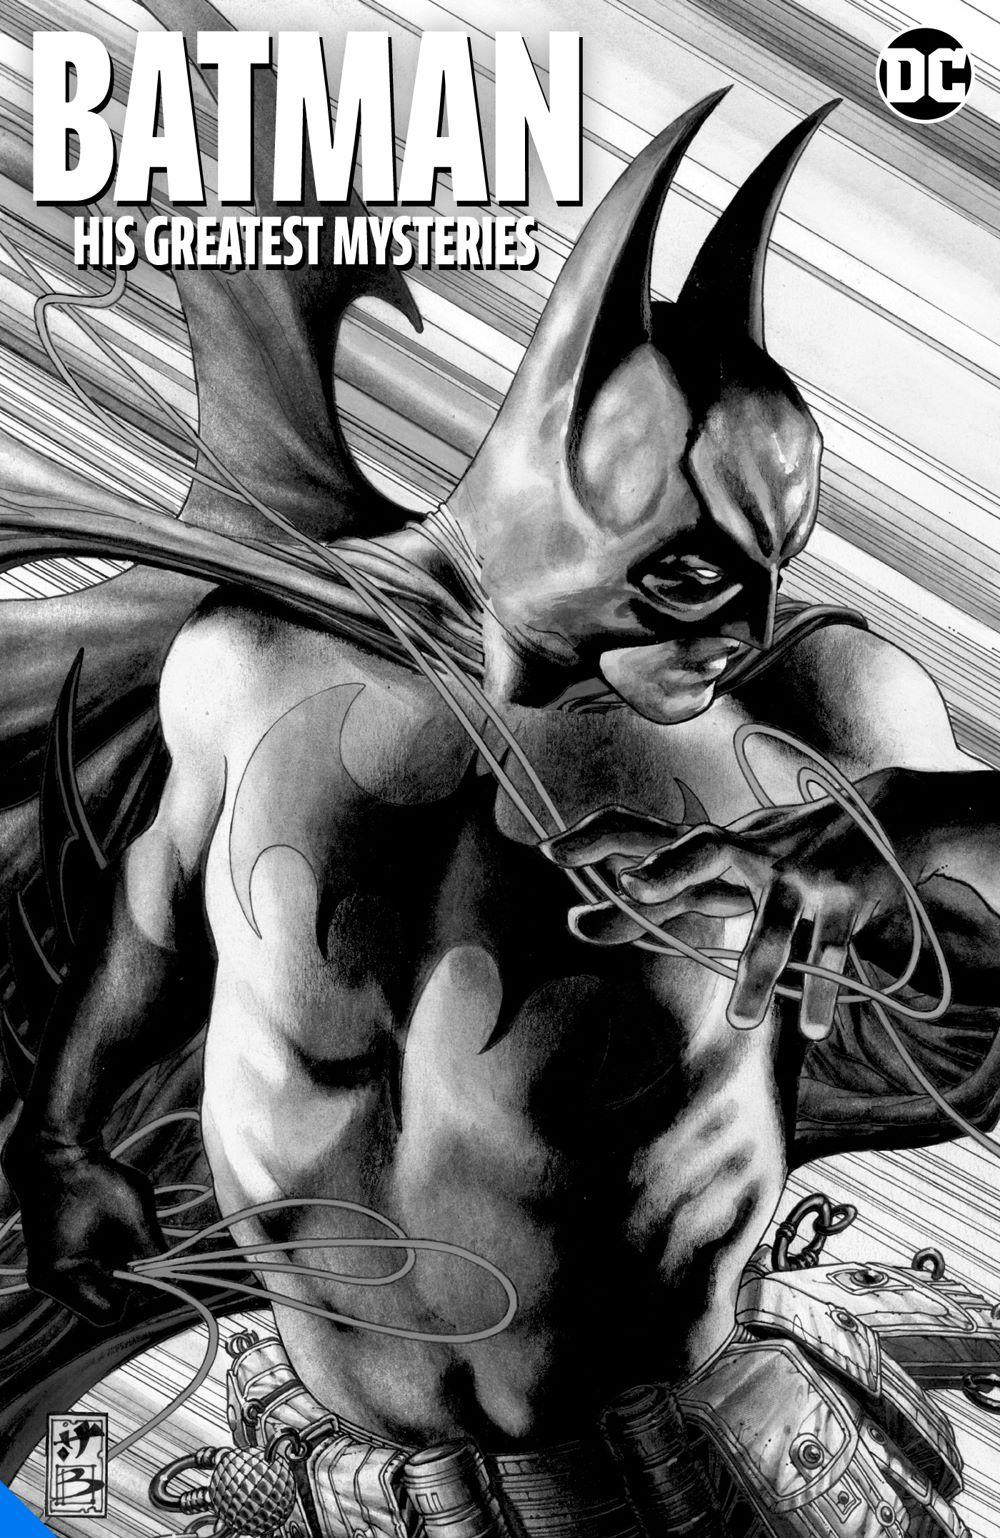 batmanhisgreatestmysteries_adv DC Comics August 2021 Solicitations